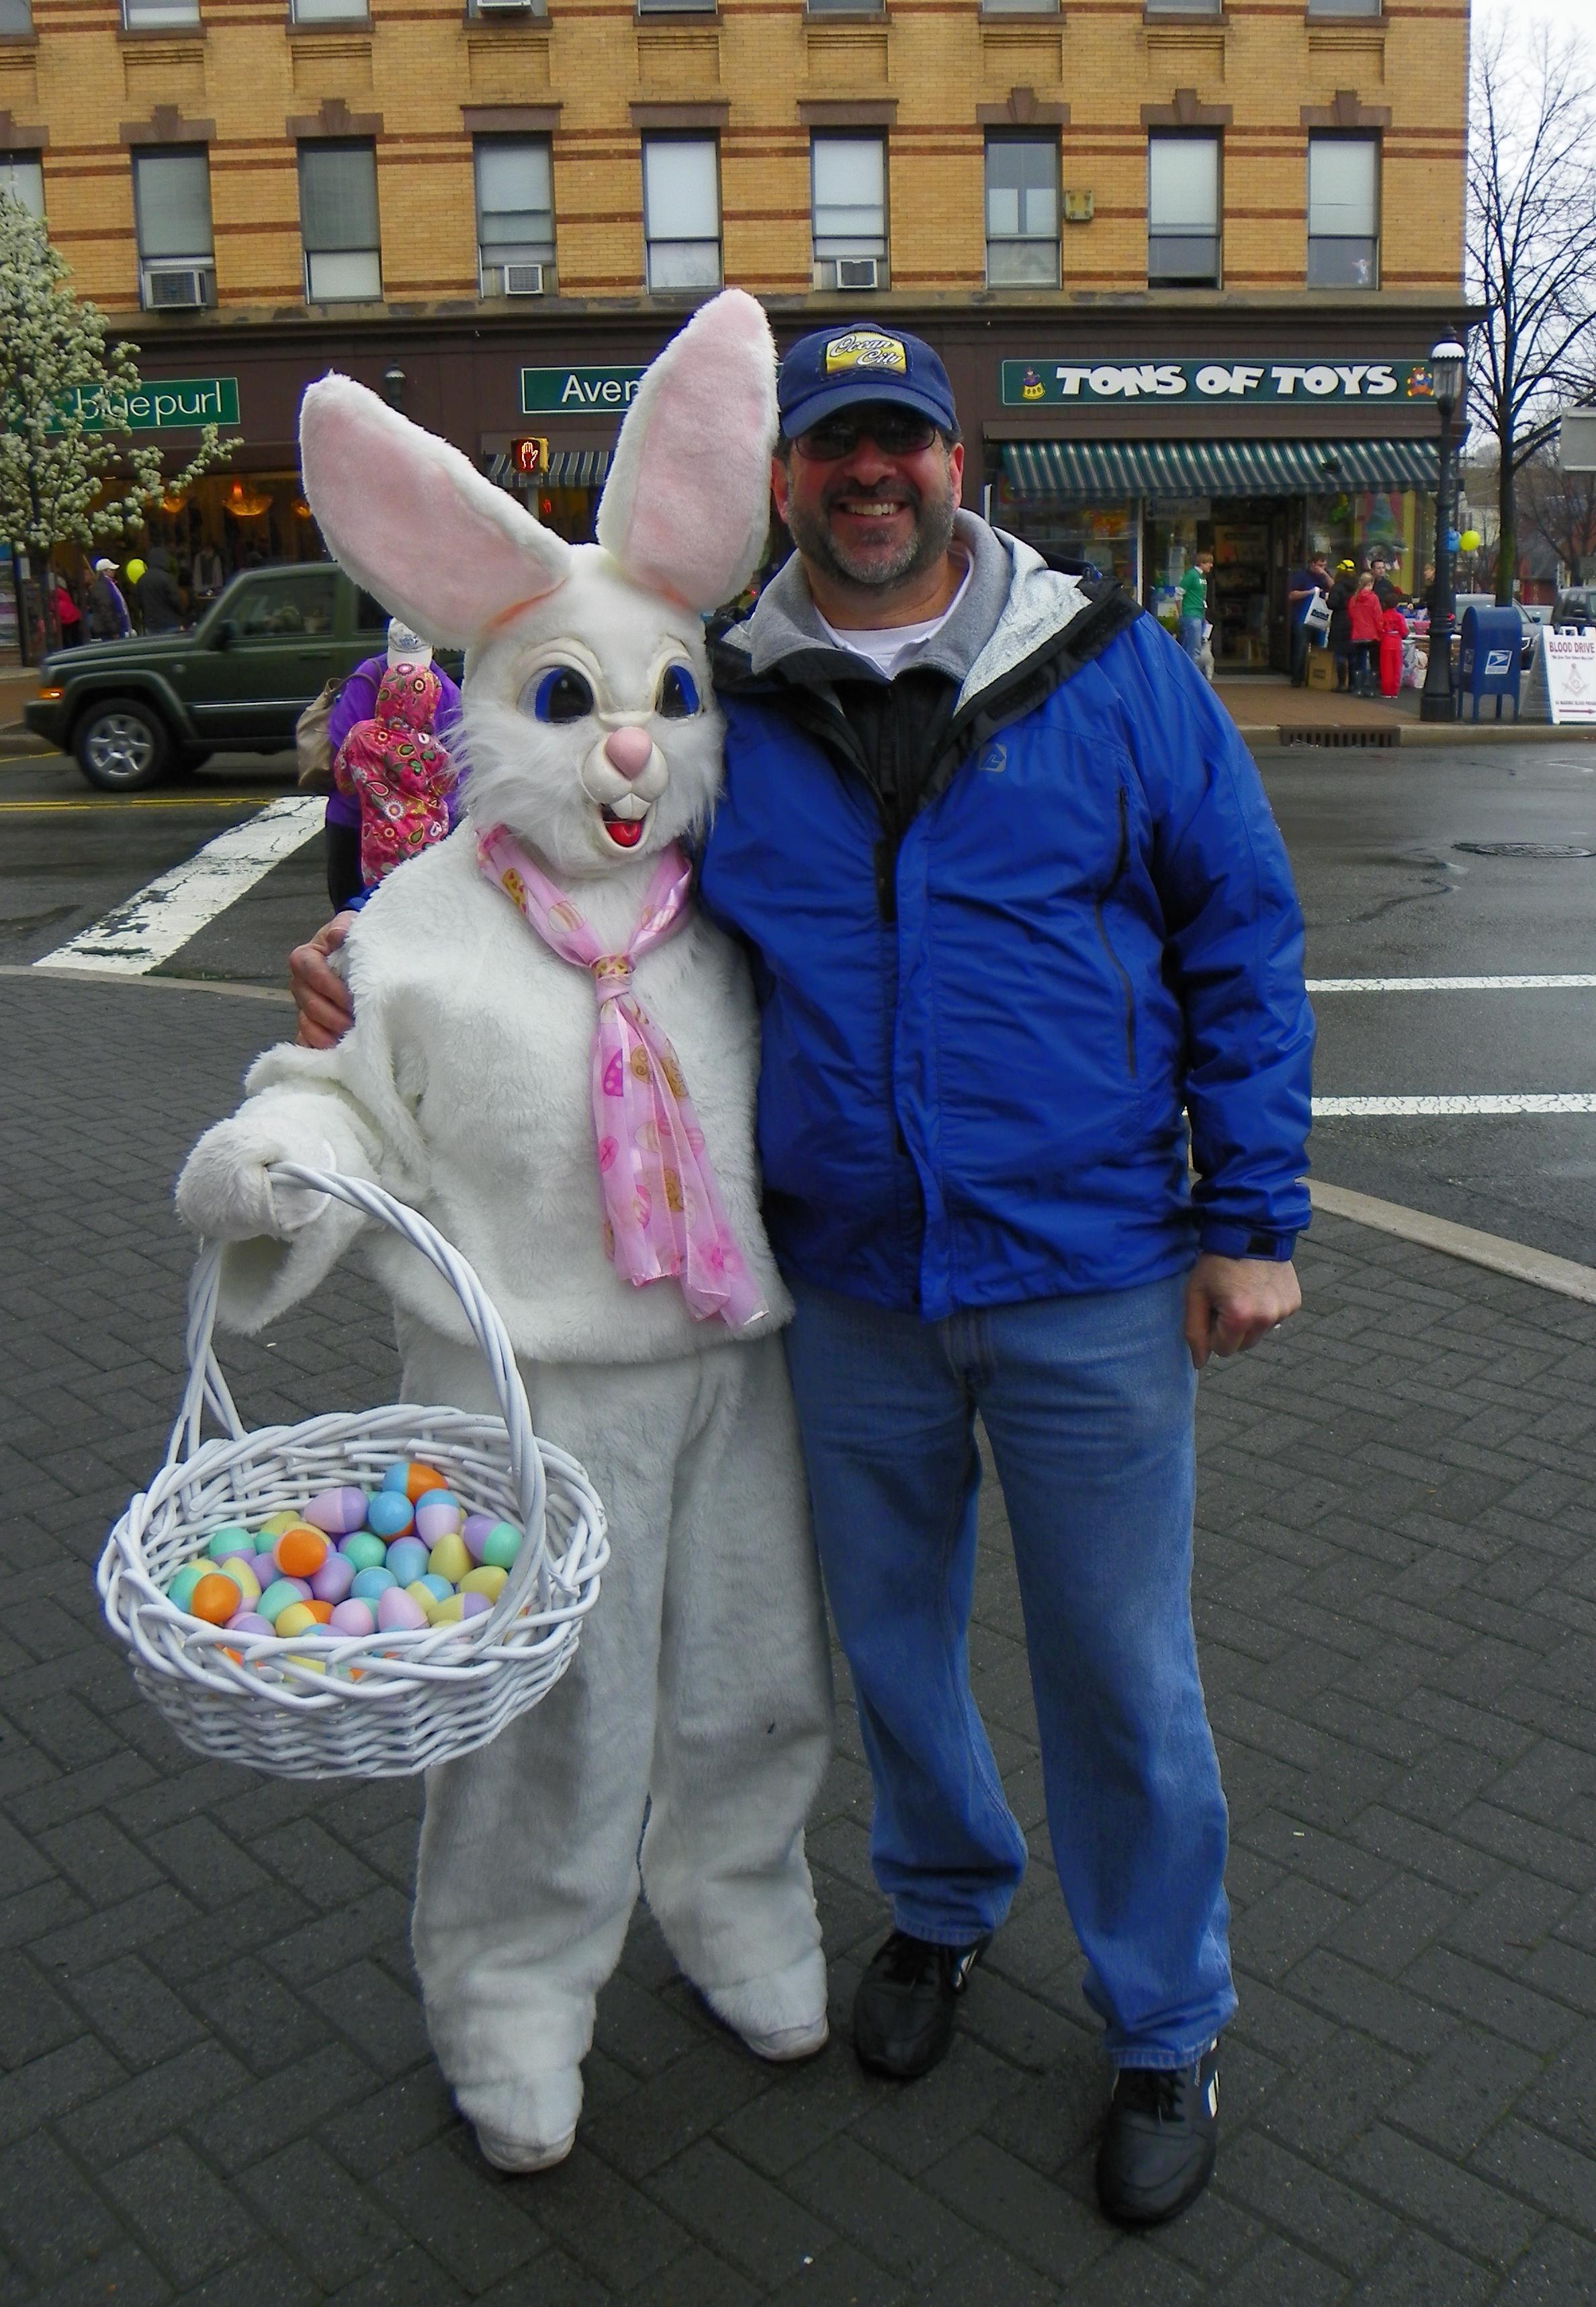 8d3cae02fe4ab425a324_Easter_Fun_Fest_2012_Peter_w_Bunny.jpg